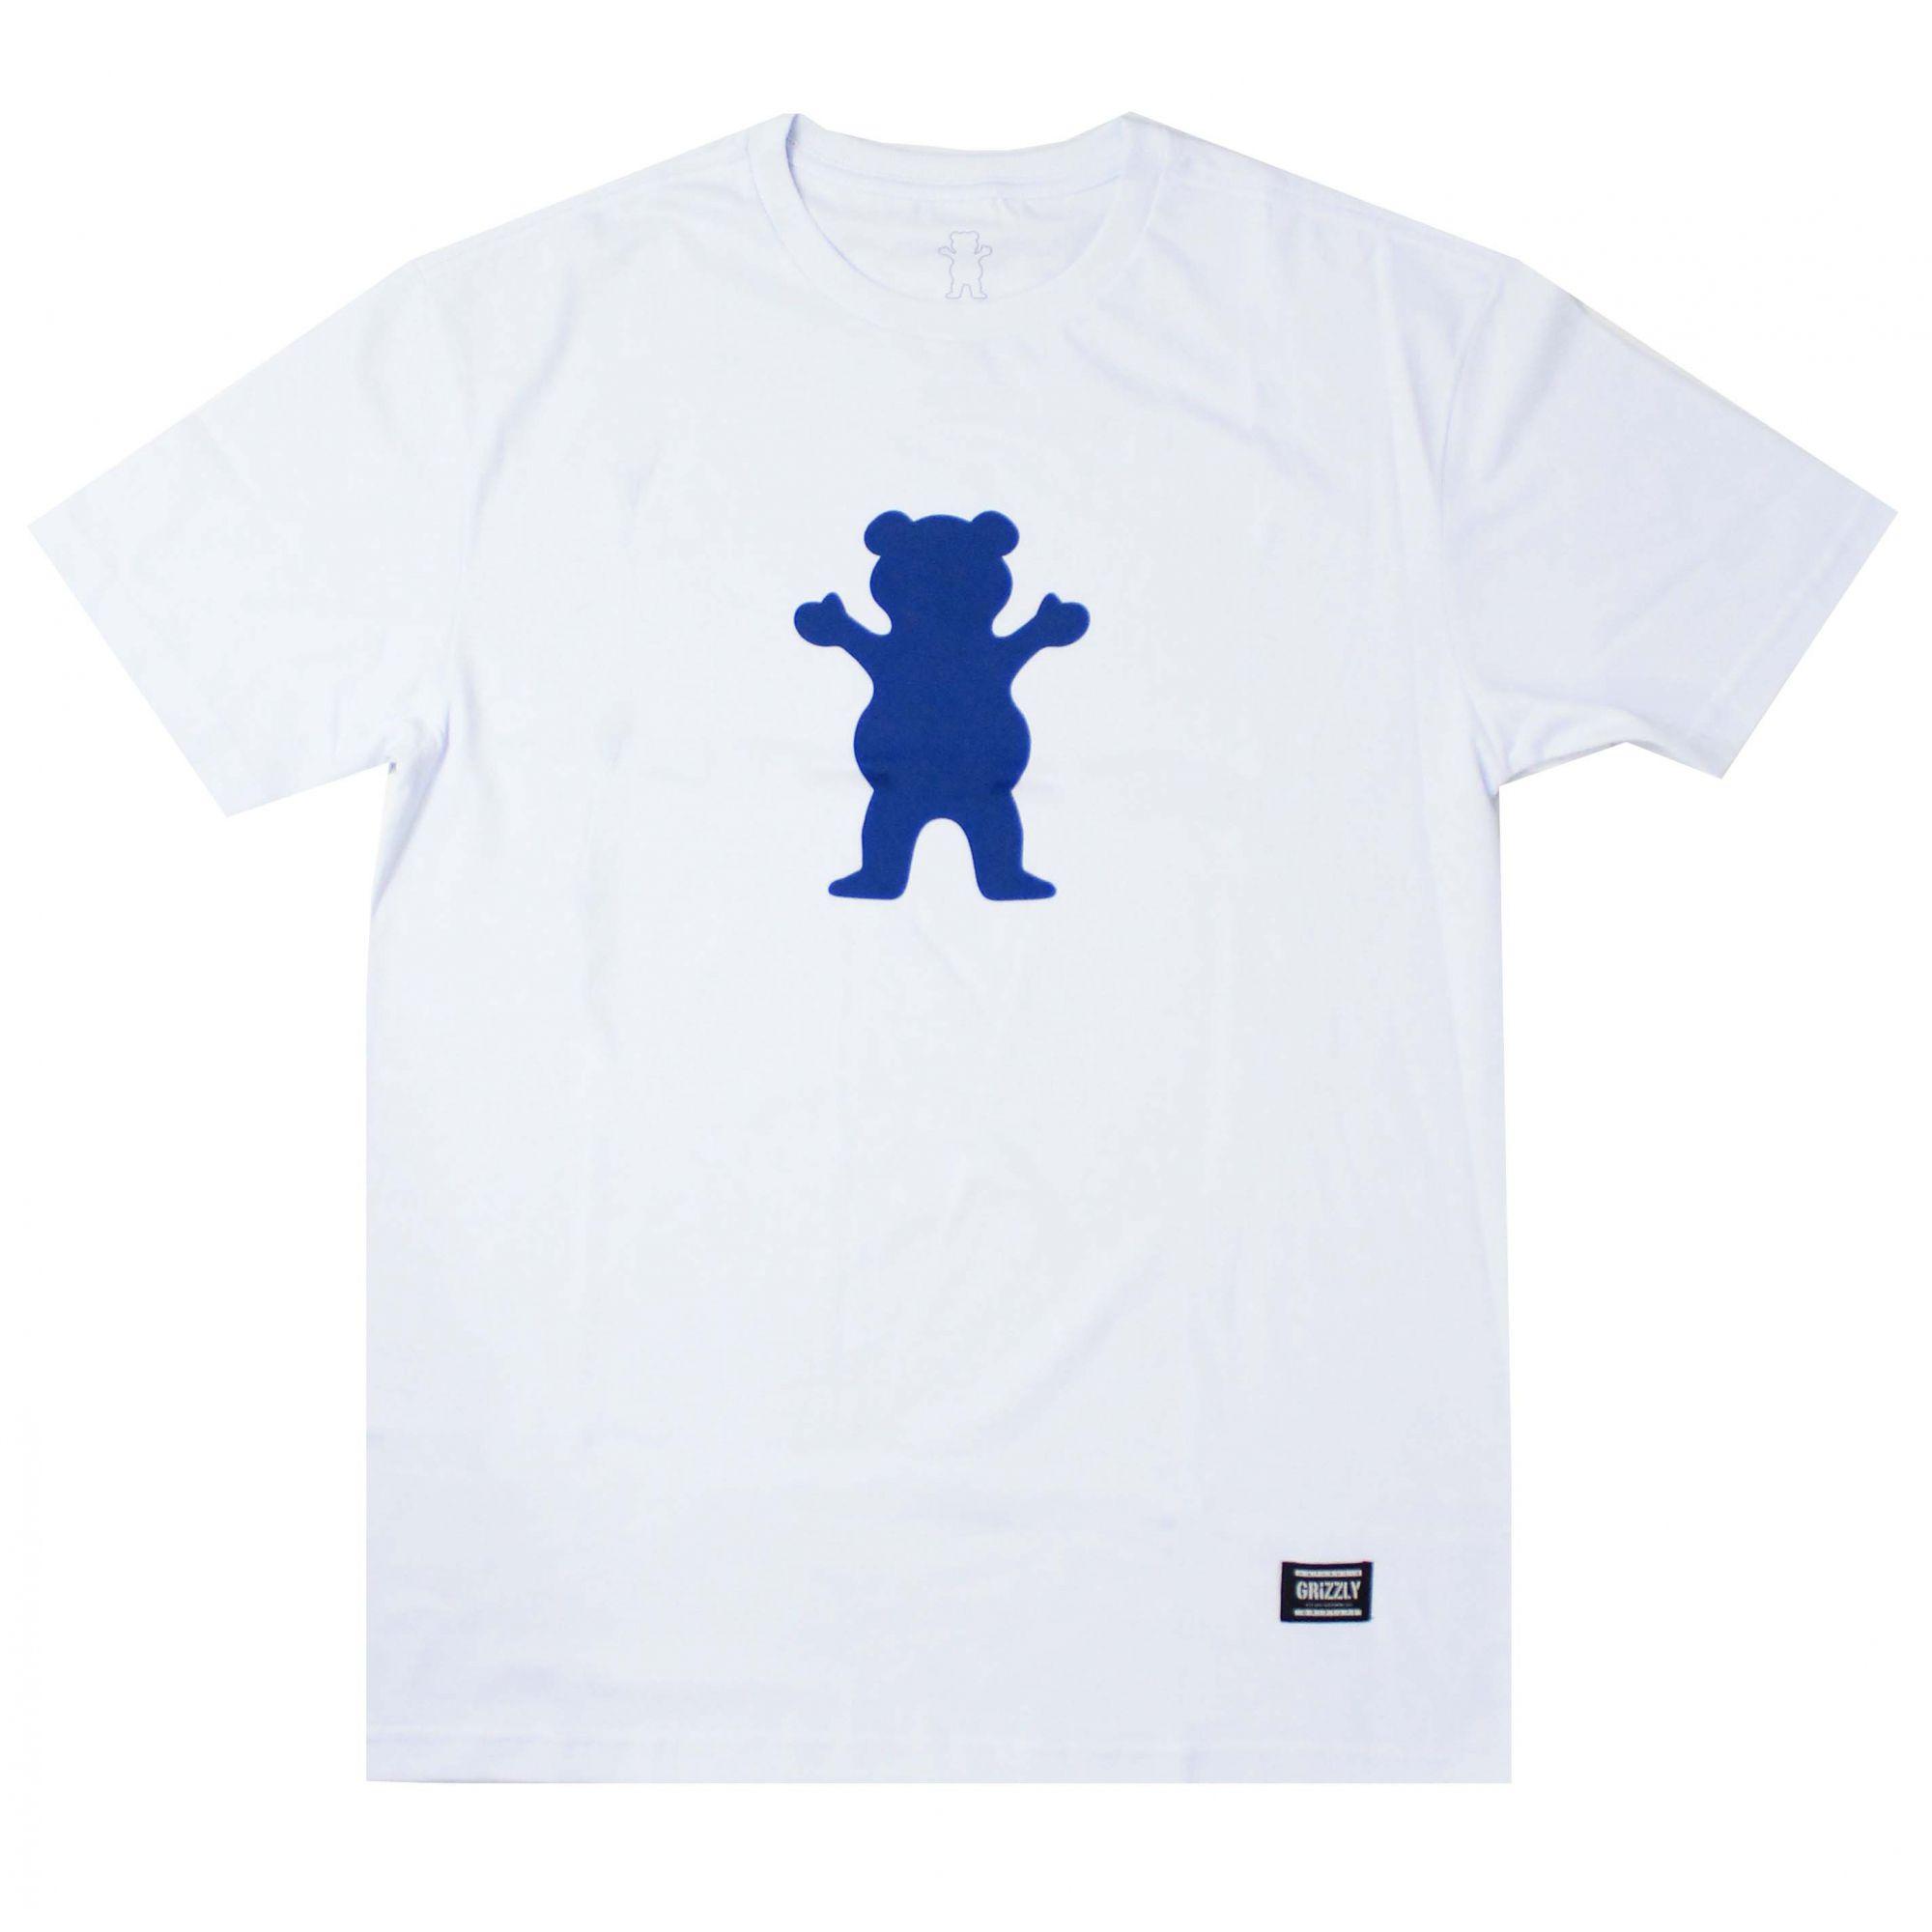 Camiseta Grizzly Og Bear Logo - Branco/Azul